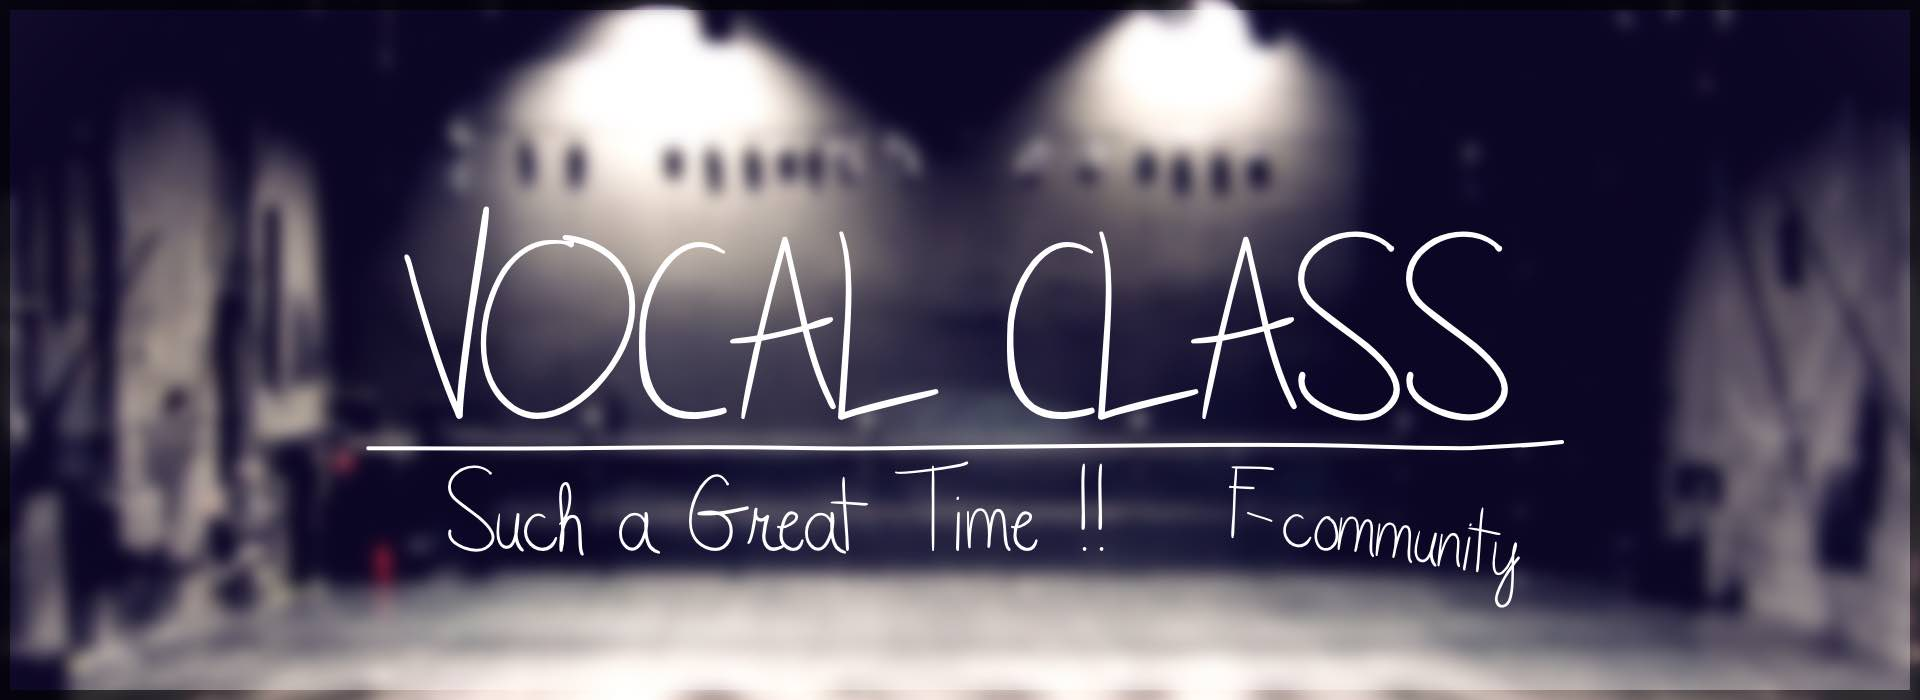 vocal クラス